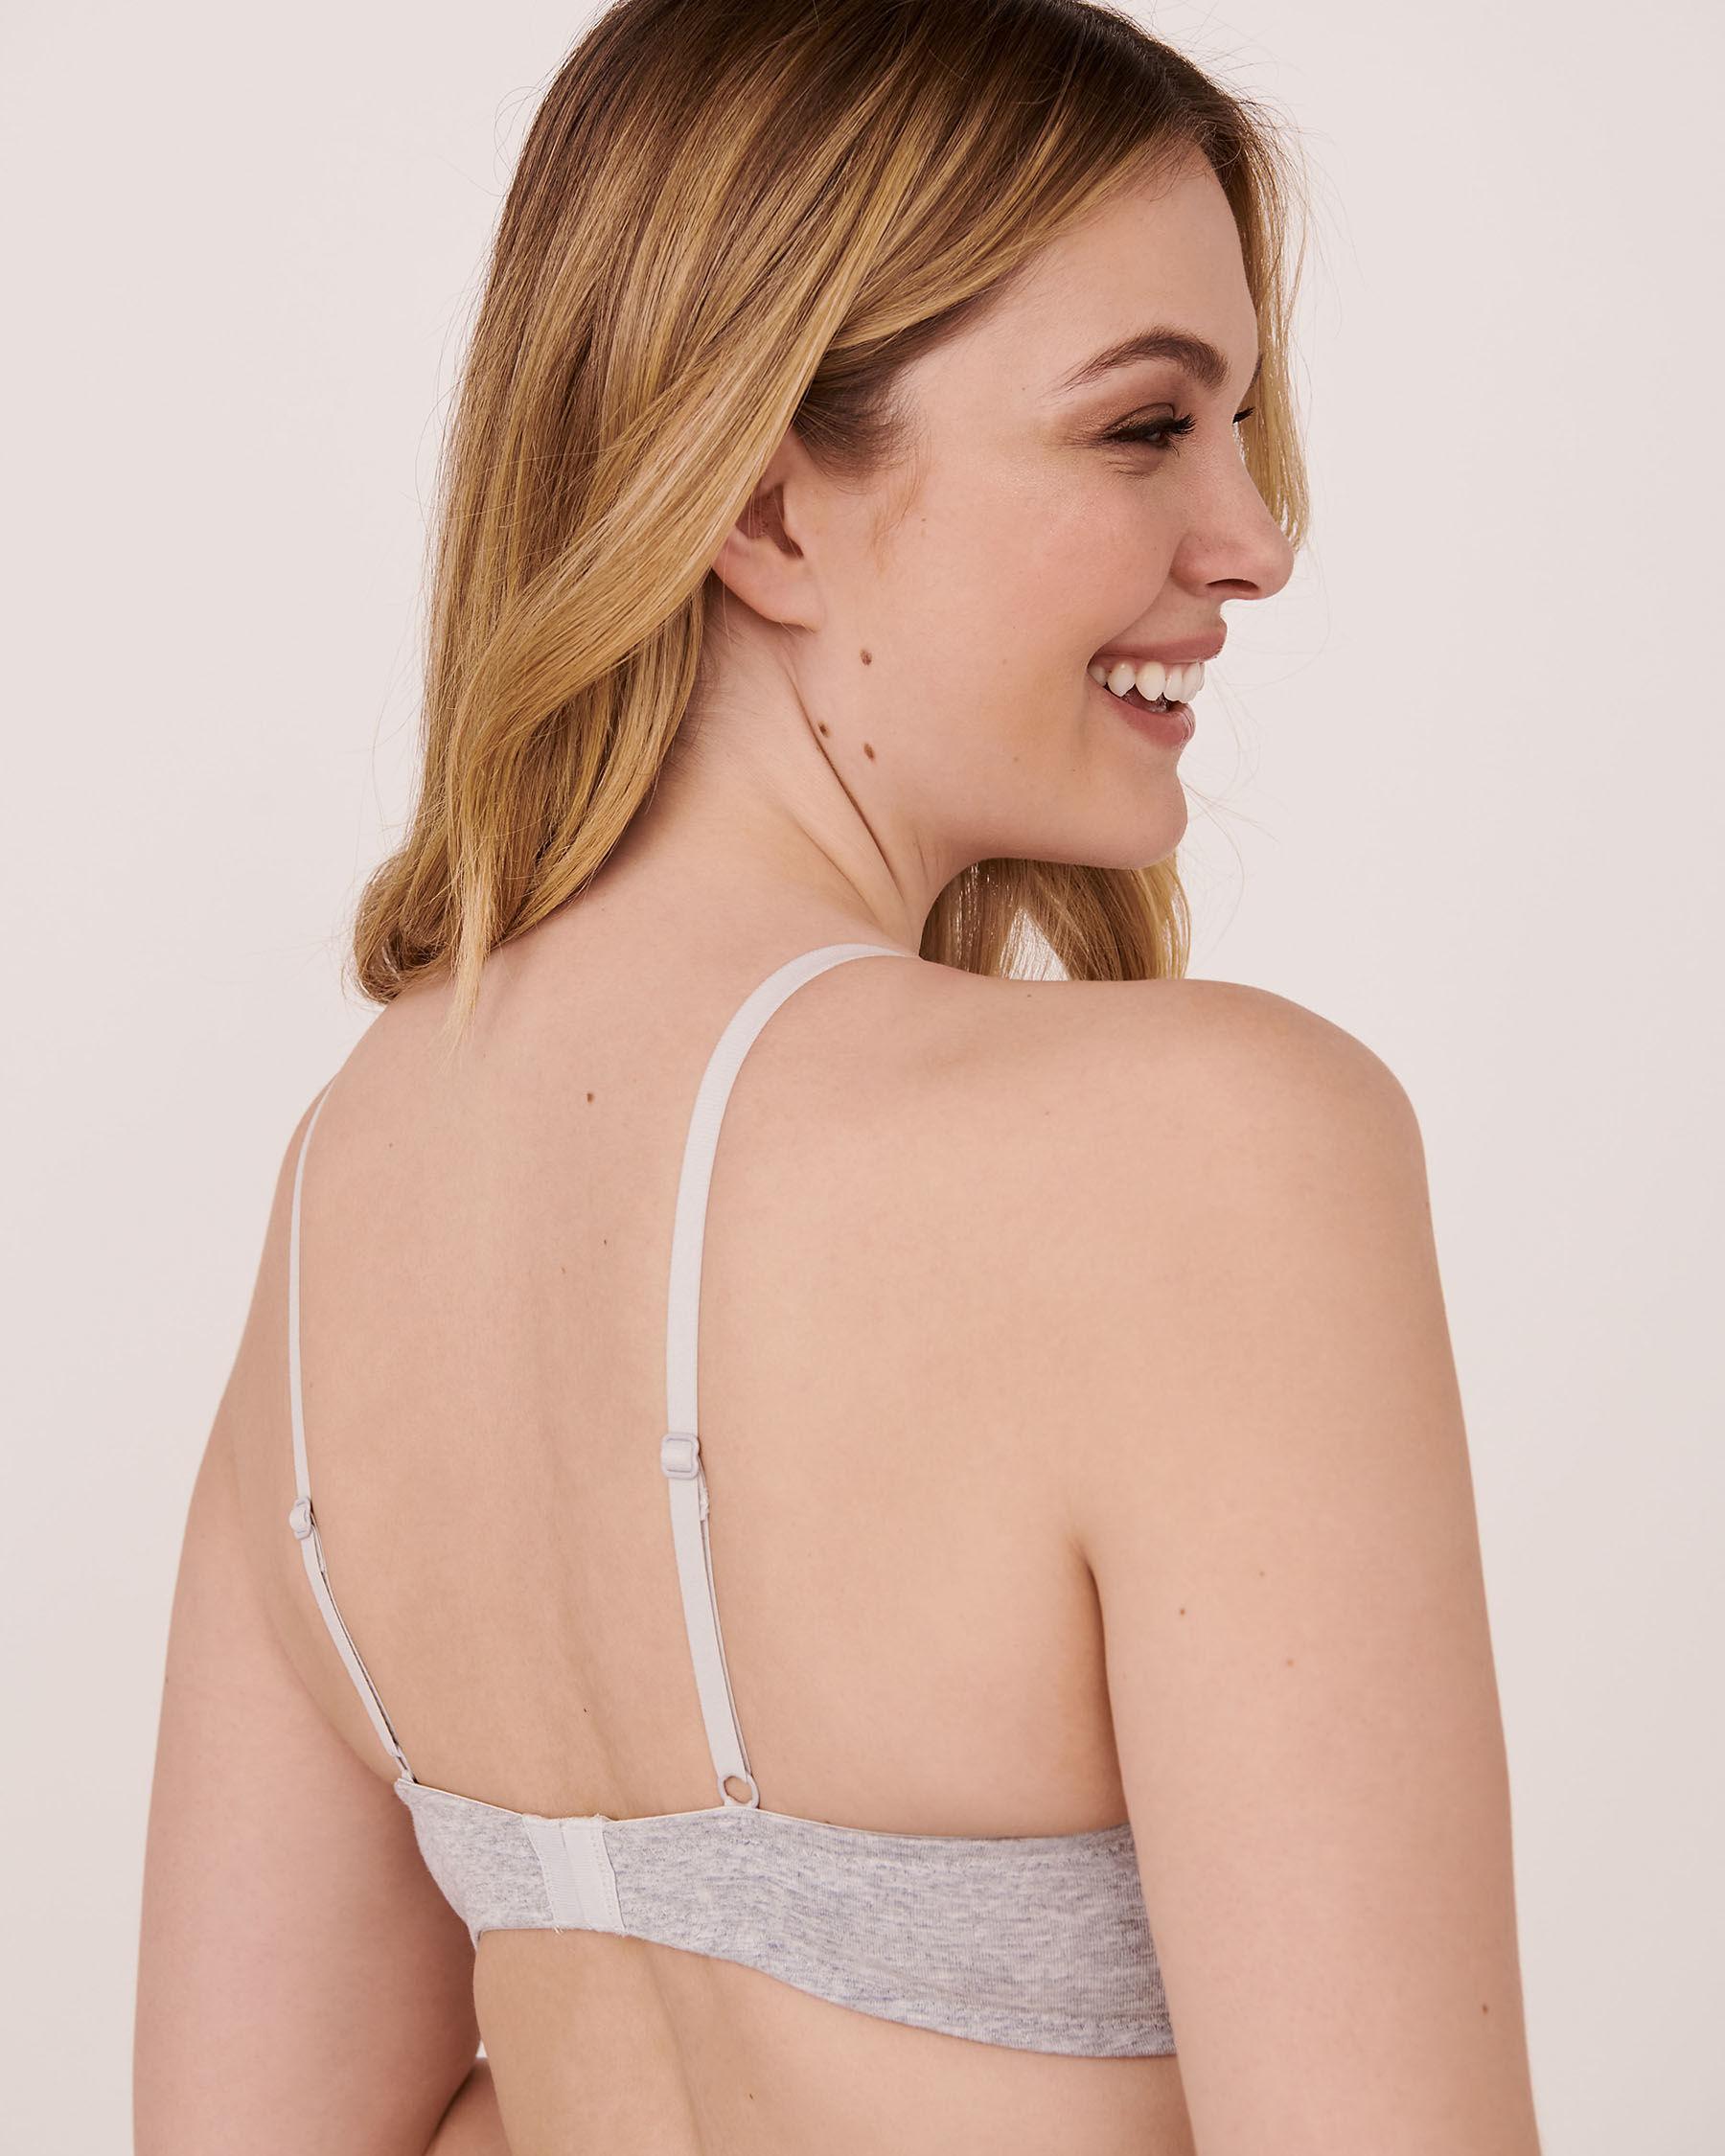 LA VIE EN ROSE Lightly Lined Cotton Bra Grey 558-113-1-00 - View2